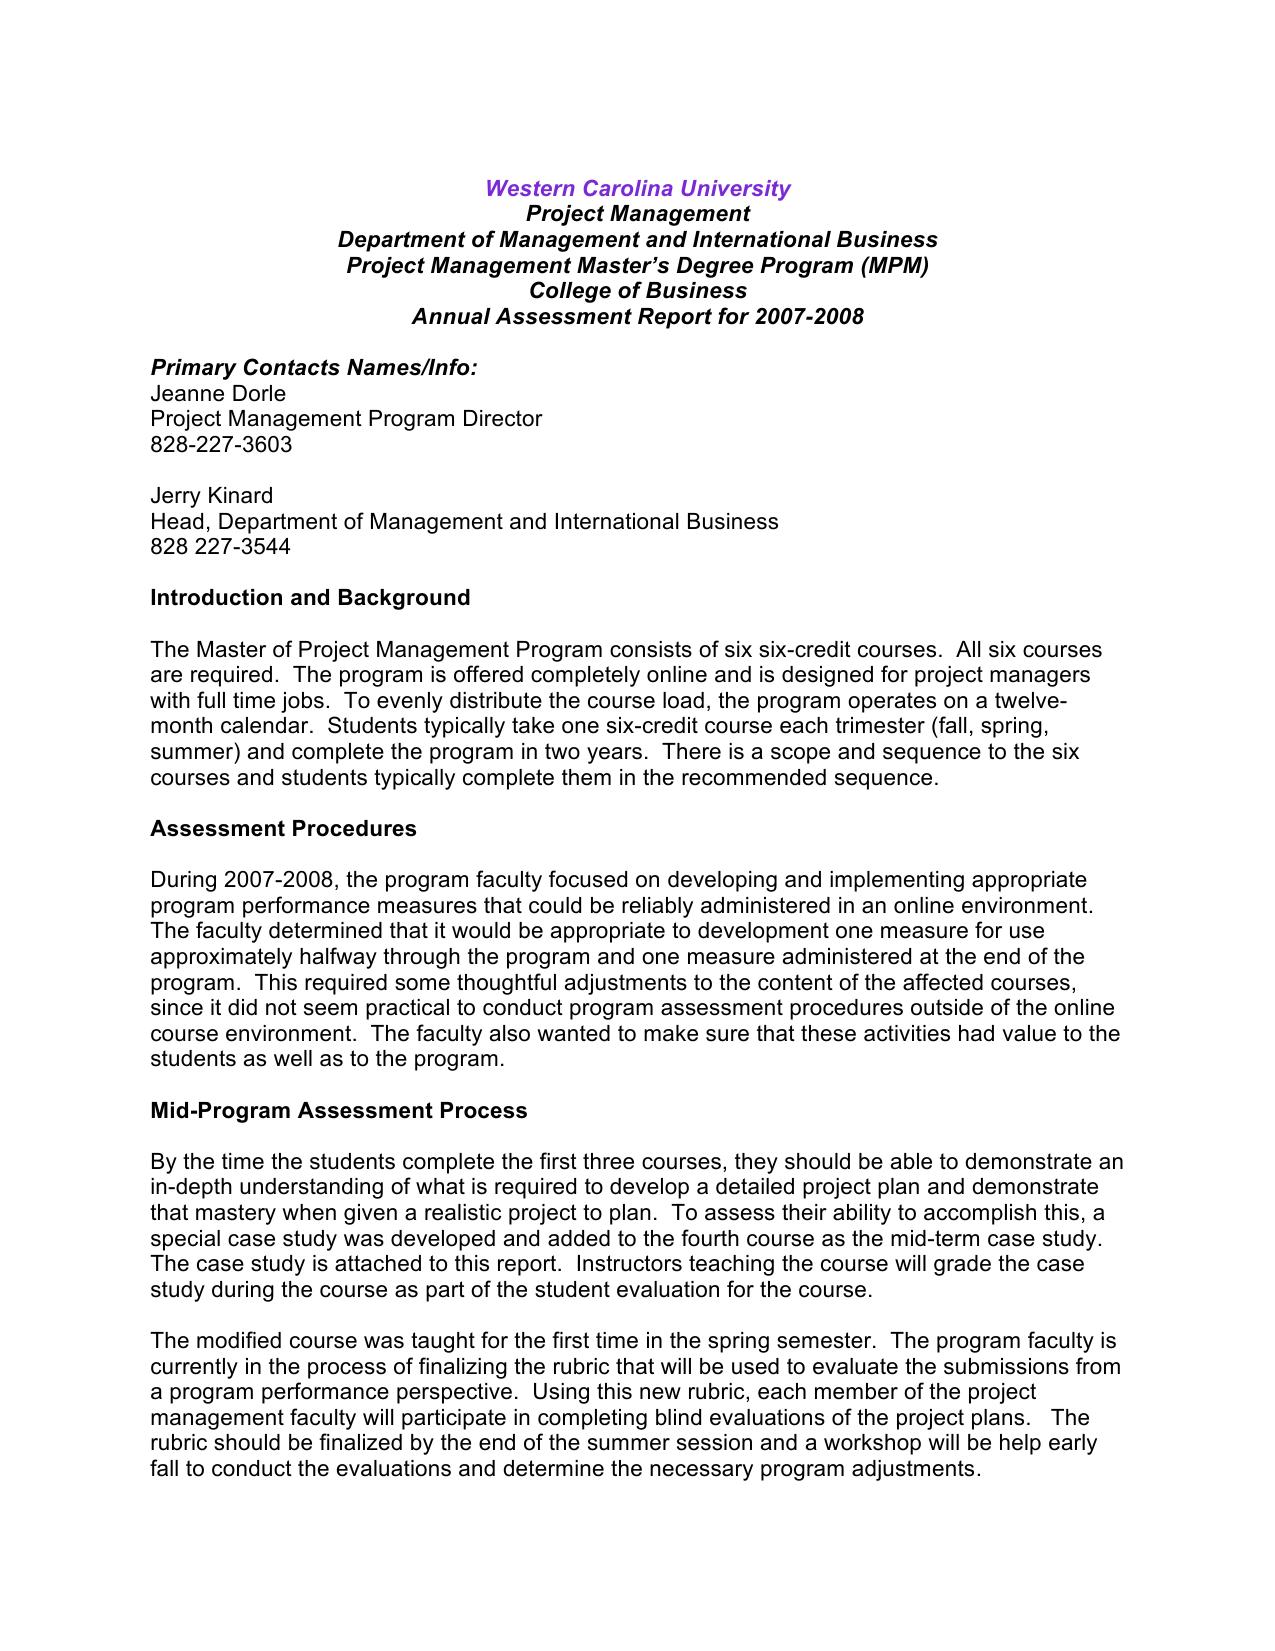 Western Carolina University Project Management Department Of